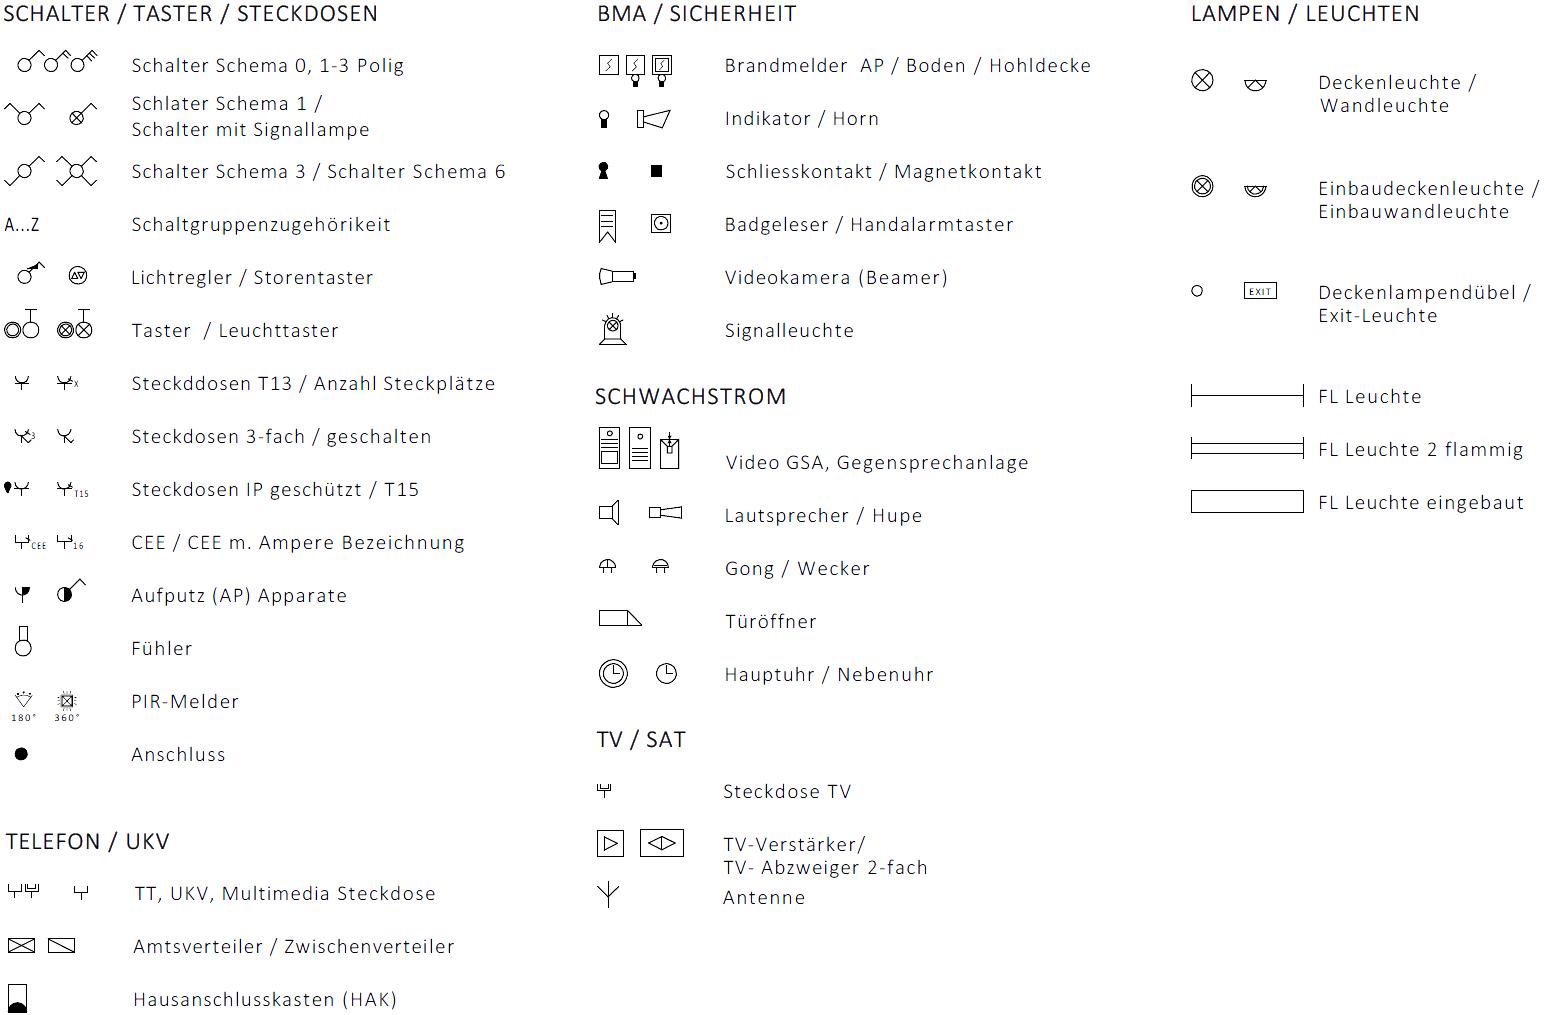 Plankopfe Revit Produkte 2019 Autodesk Knowledge Network 6